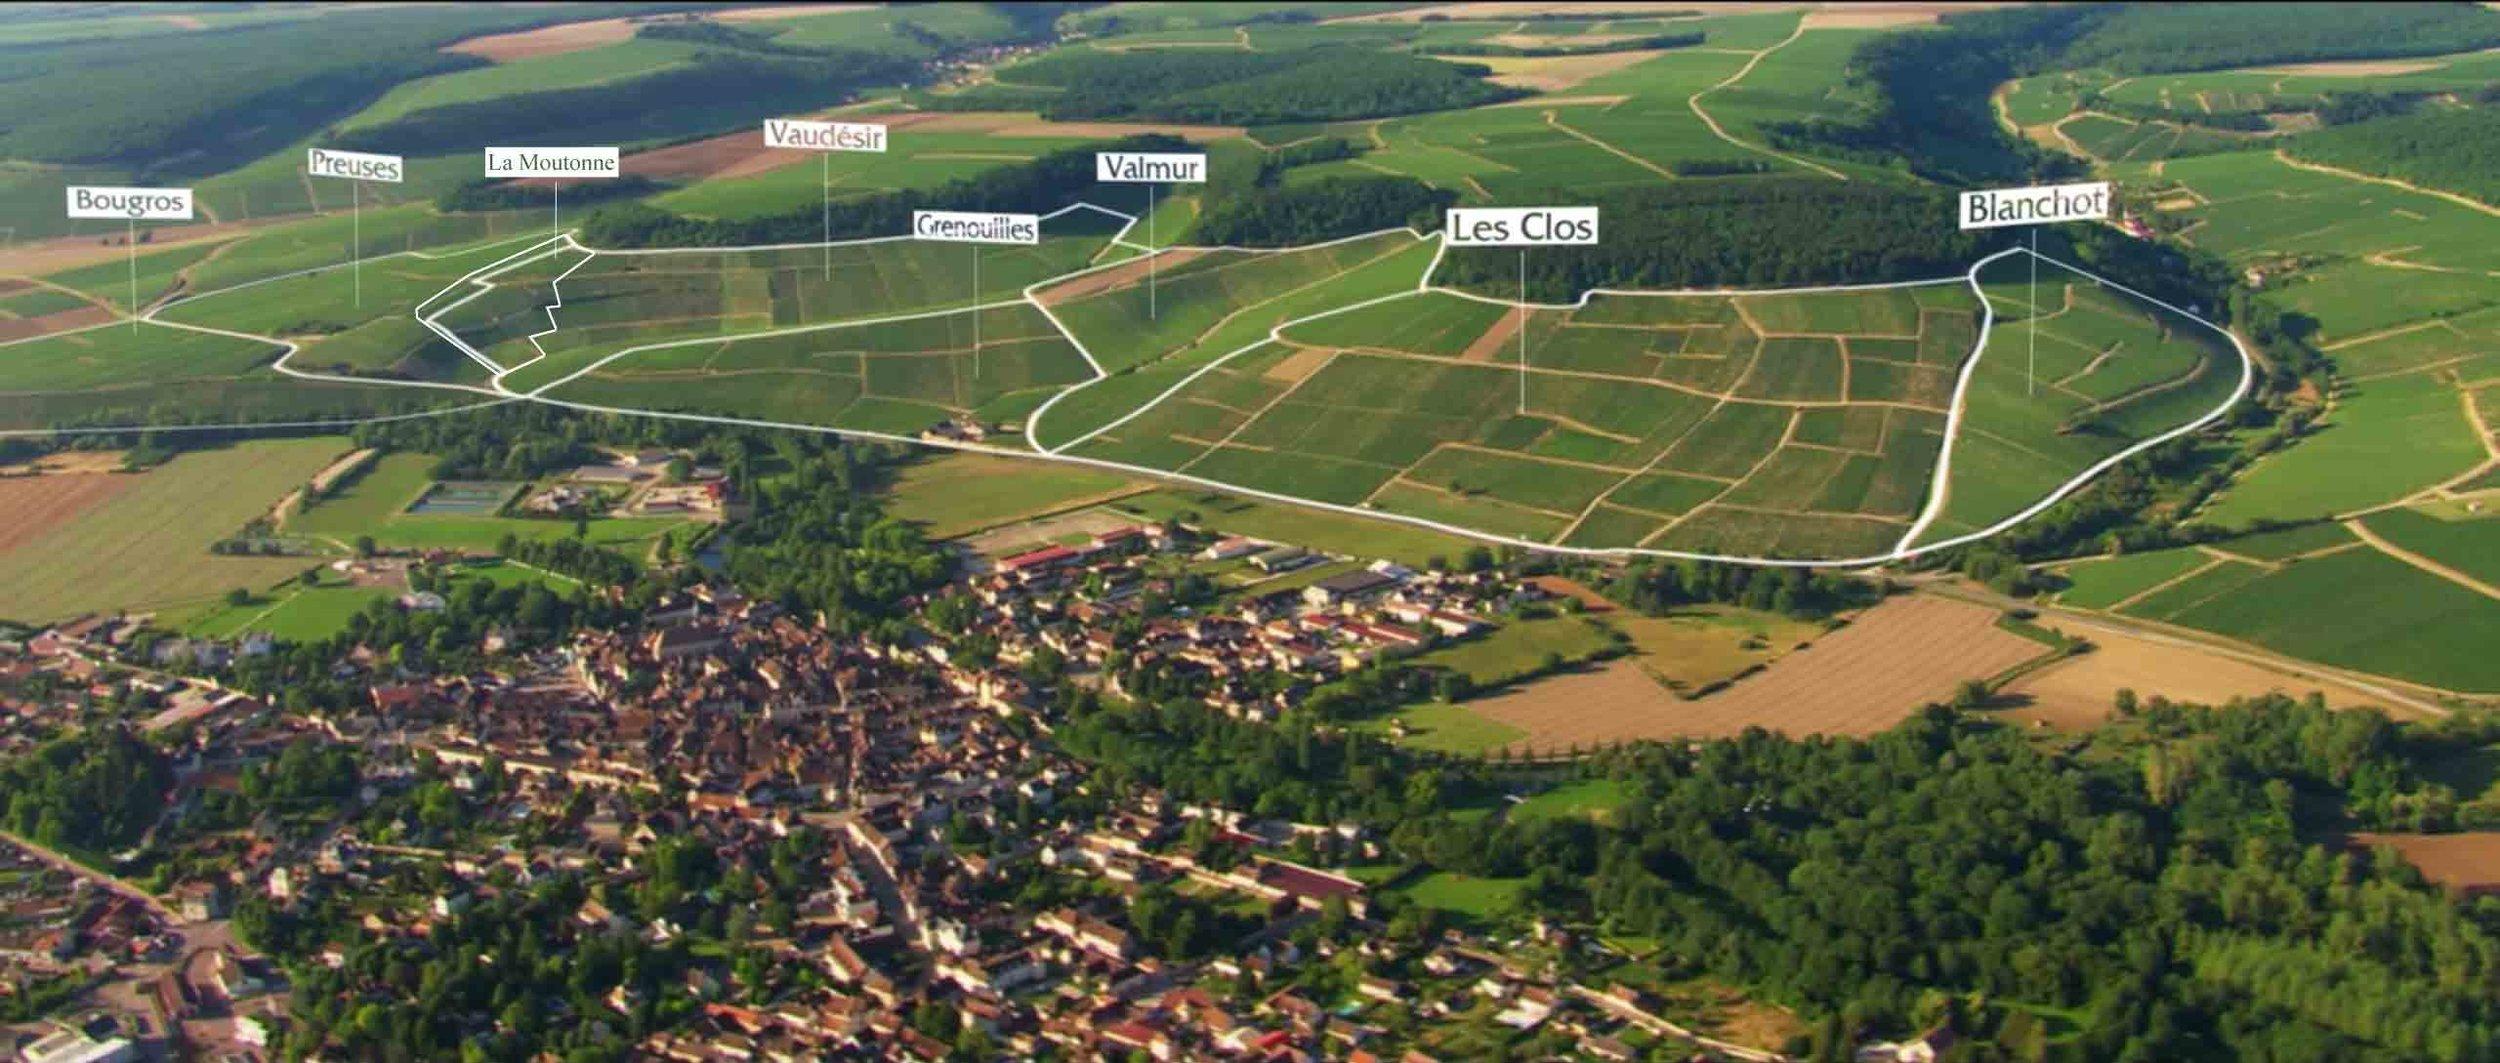 Photo source:Bourgogne Wine Board BIVB  Chablis Grand Cru with 7 climats, plus unofficial parcel of La Moutonne